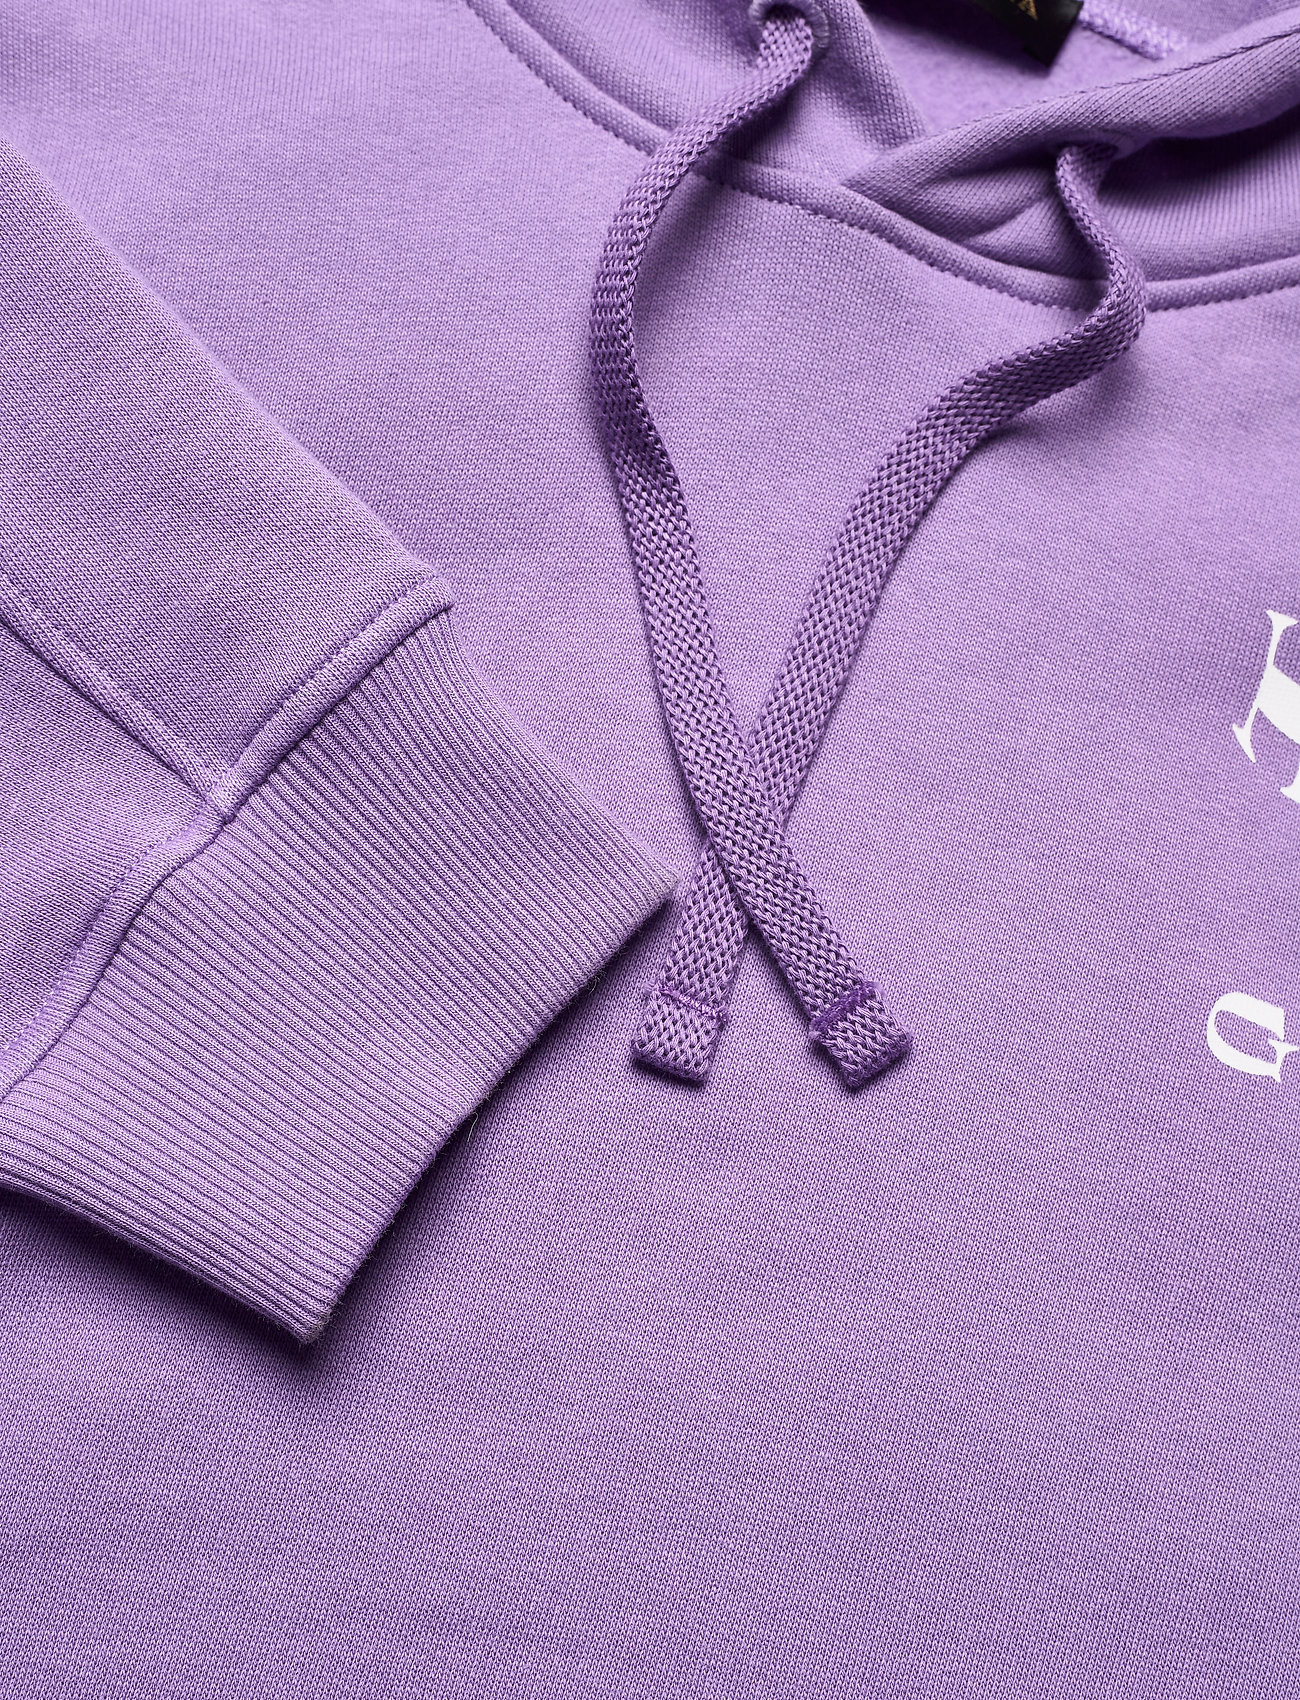 STINE GOYA - Adrisa, 1209 Tracksuit Goya - sweatshirts en hoodies - lilac - 2